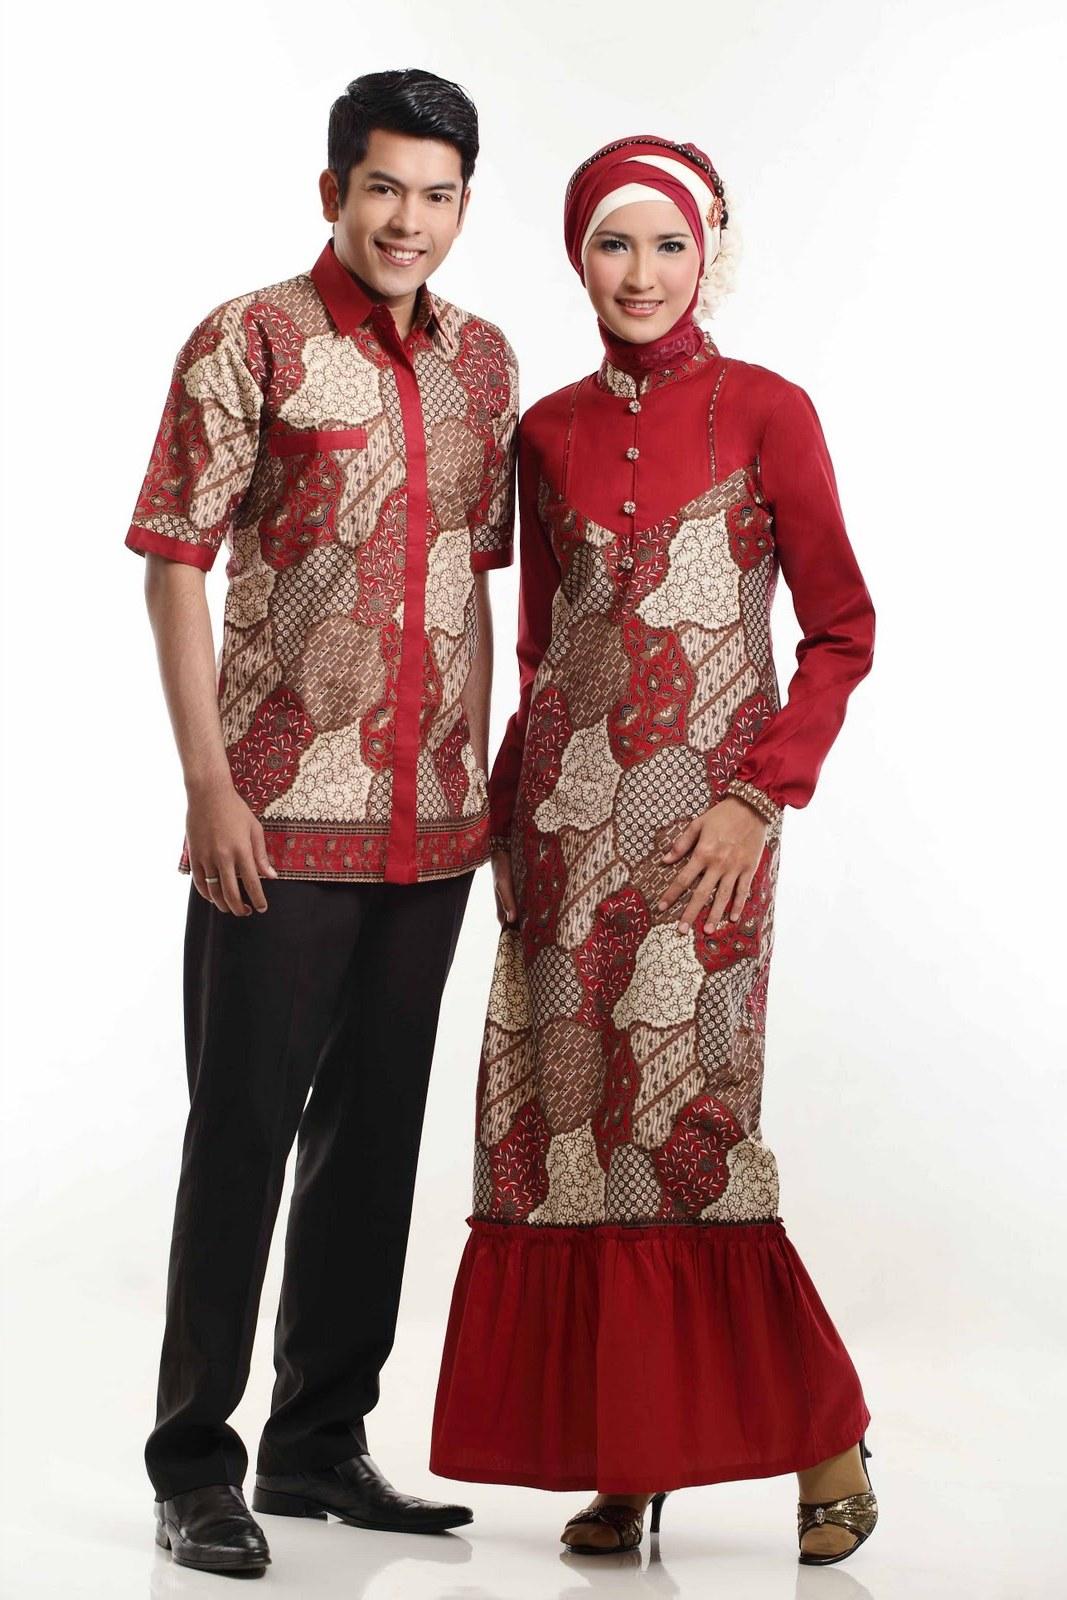 Model Trend Baju Lebaran H9d9 Bintang anda Trend Model Baju Batik Lebaran Terbaru 2013